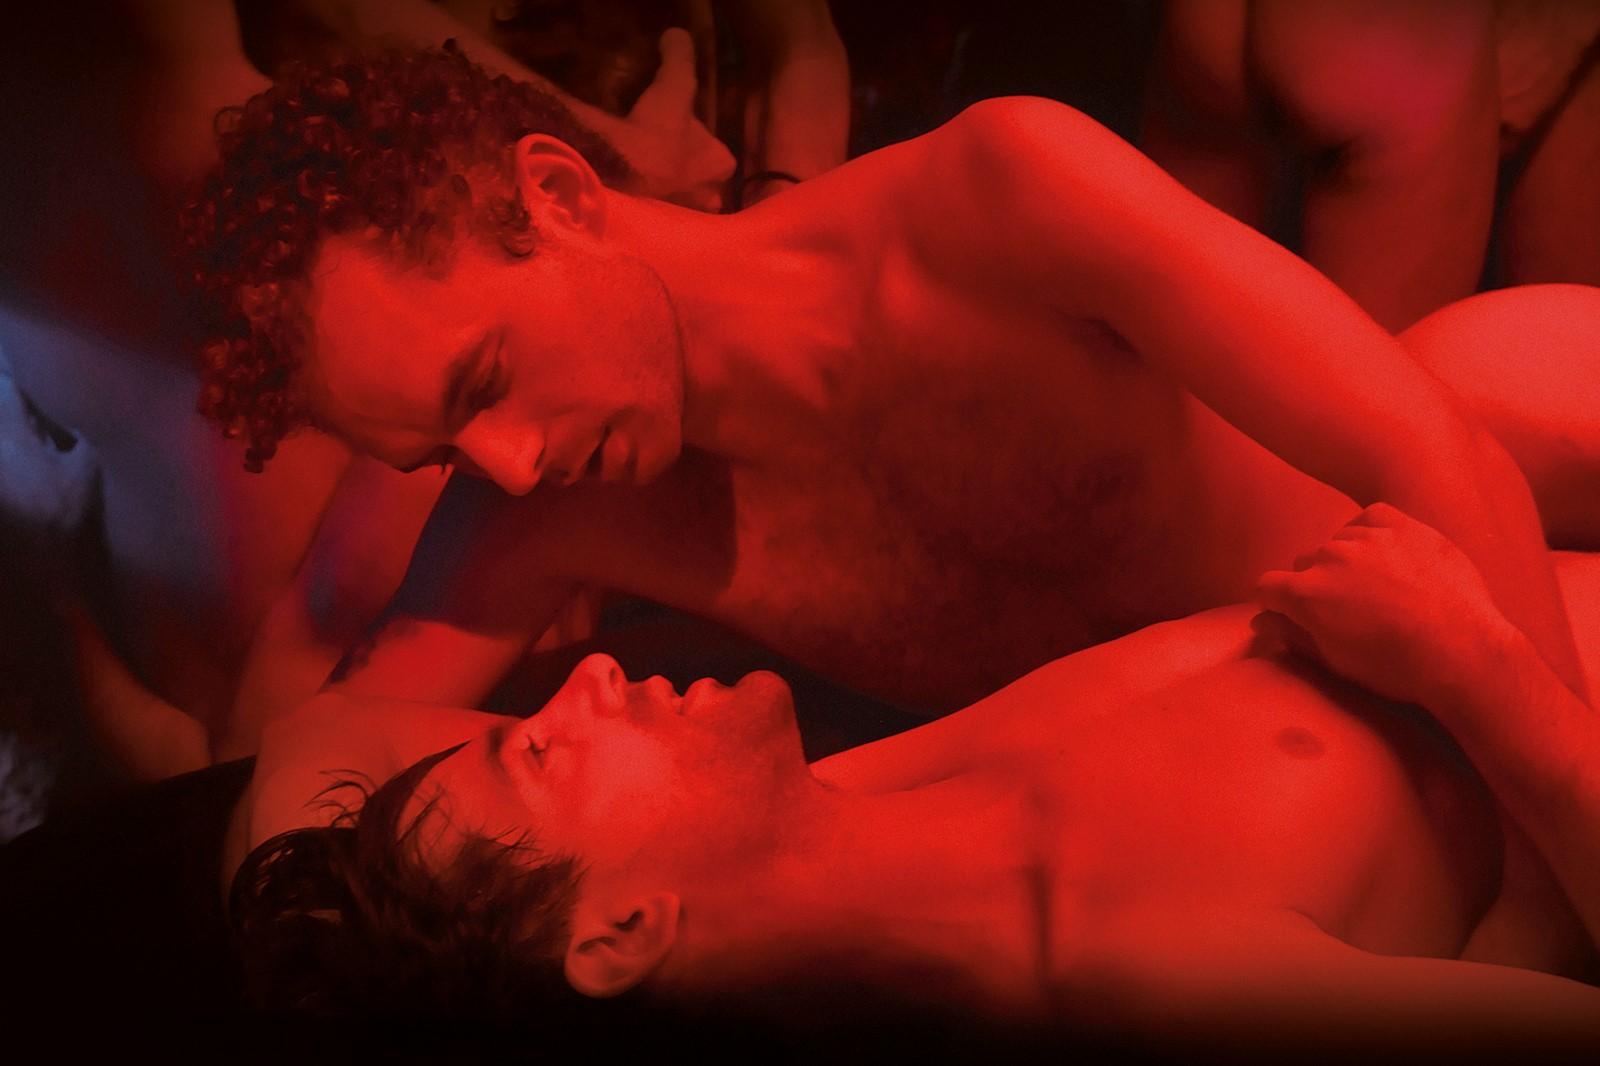 Porno erotik izleSikiş pornotv izleseneTürk pornoCanli